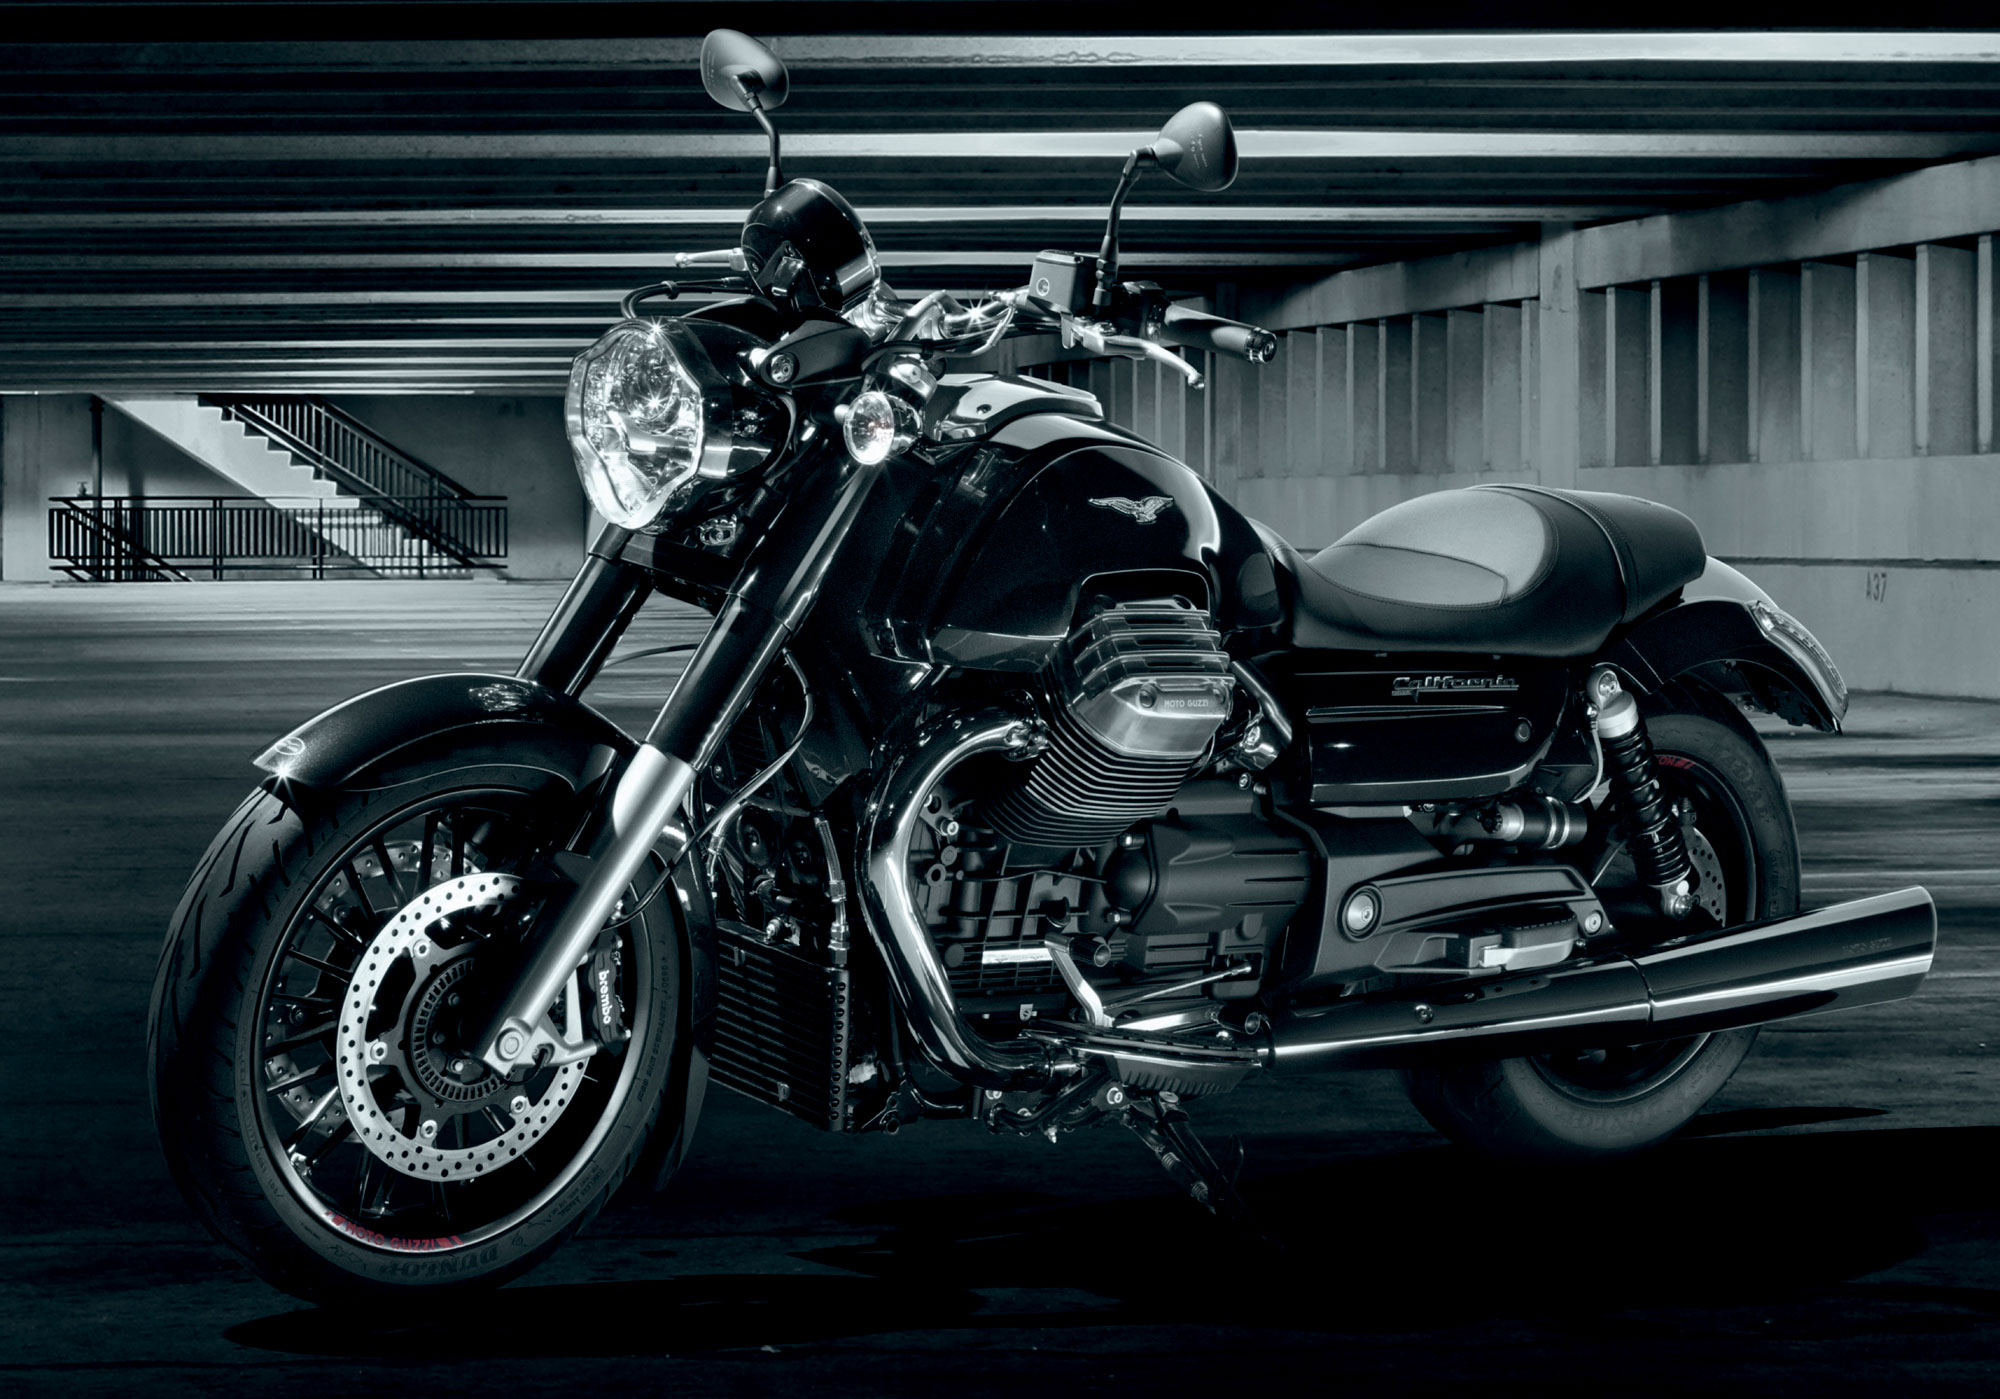 2013 Moto Guzzi California 1400 Custom Review